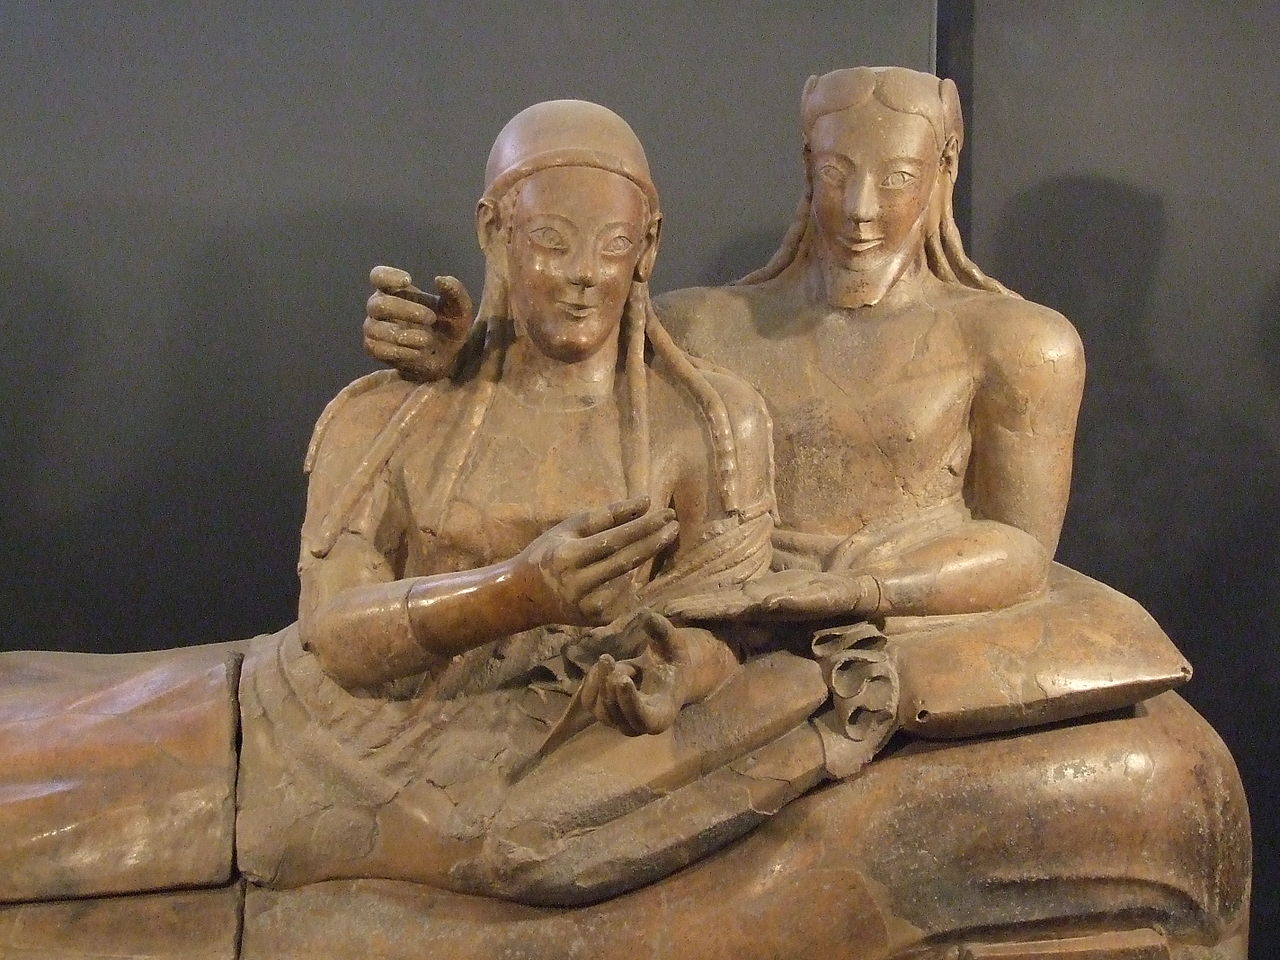 Museo Nazionale Etrusco di Villa Giulia: apertura serale